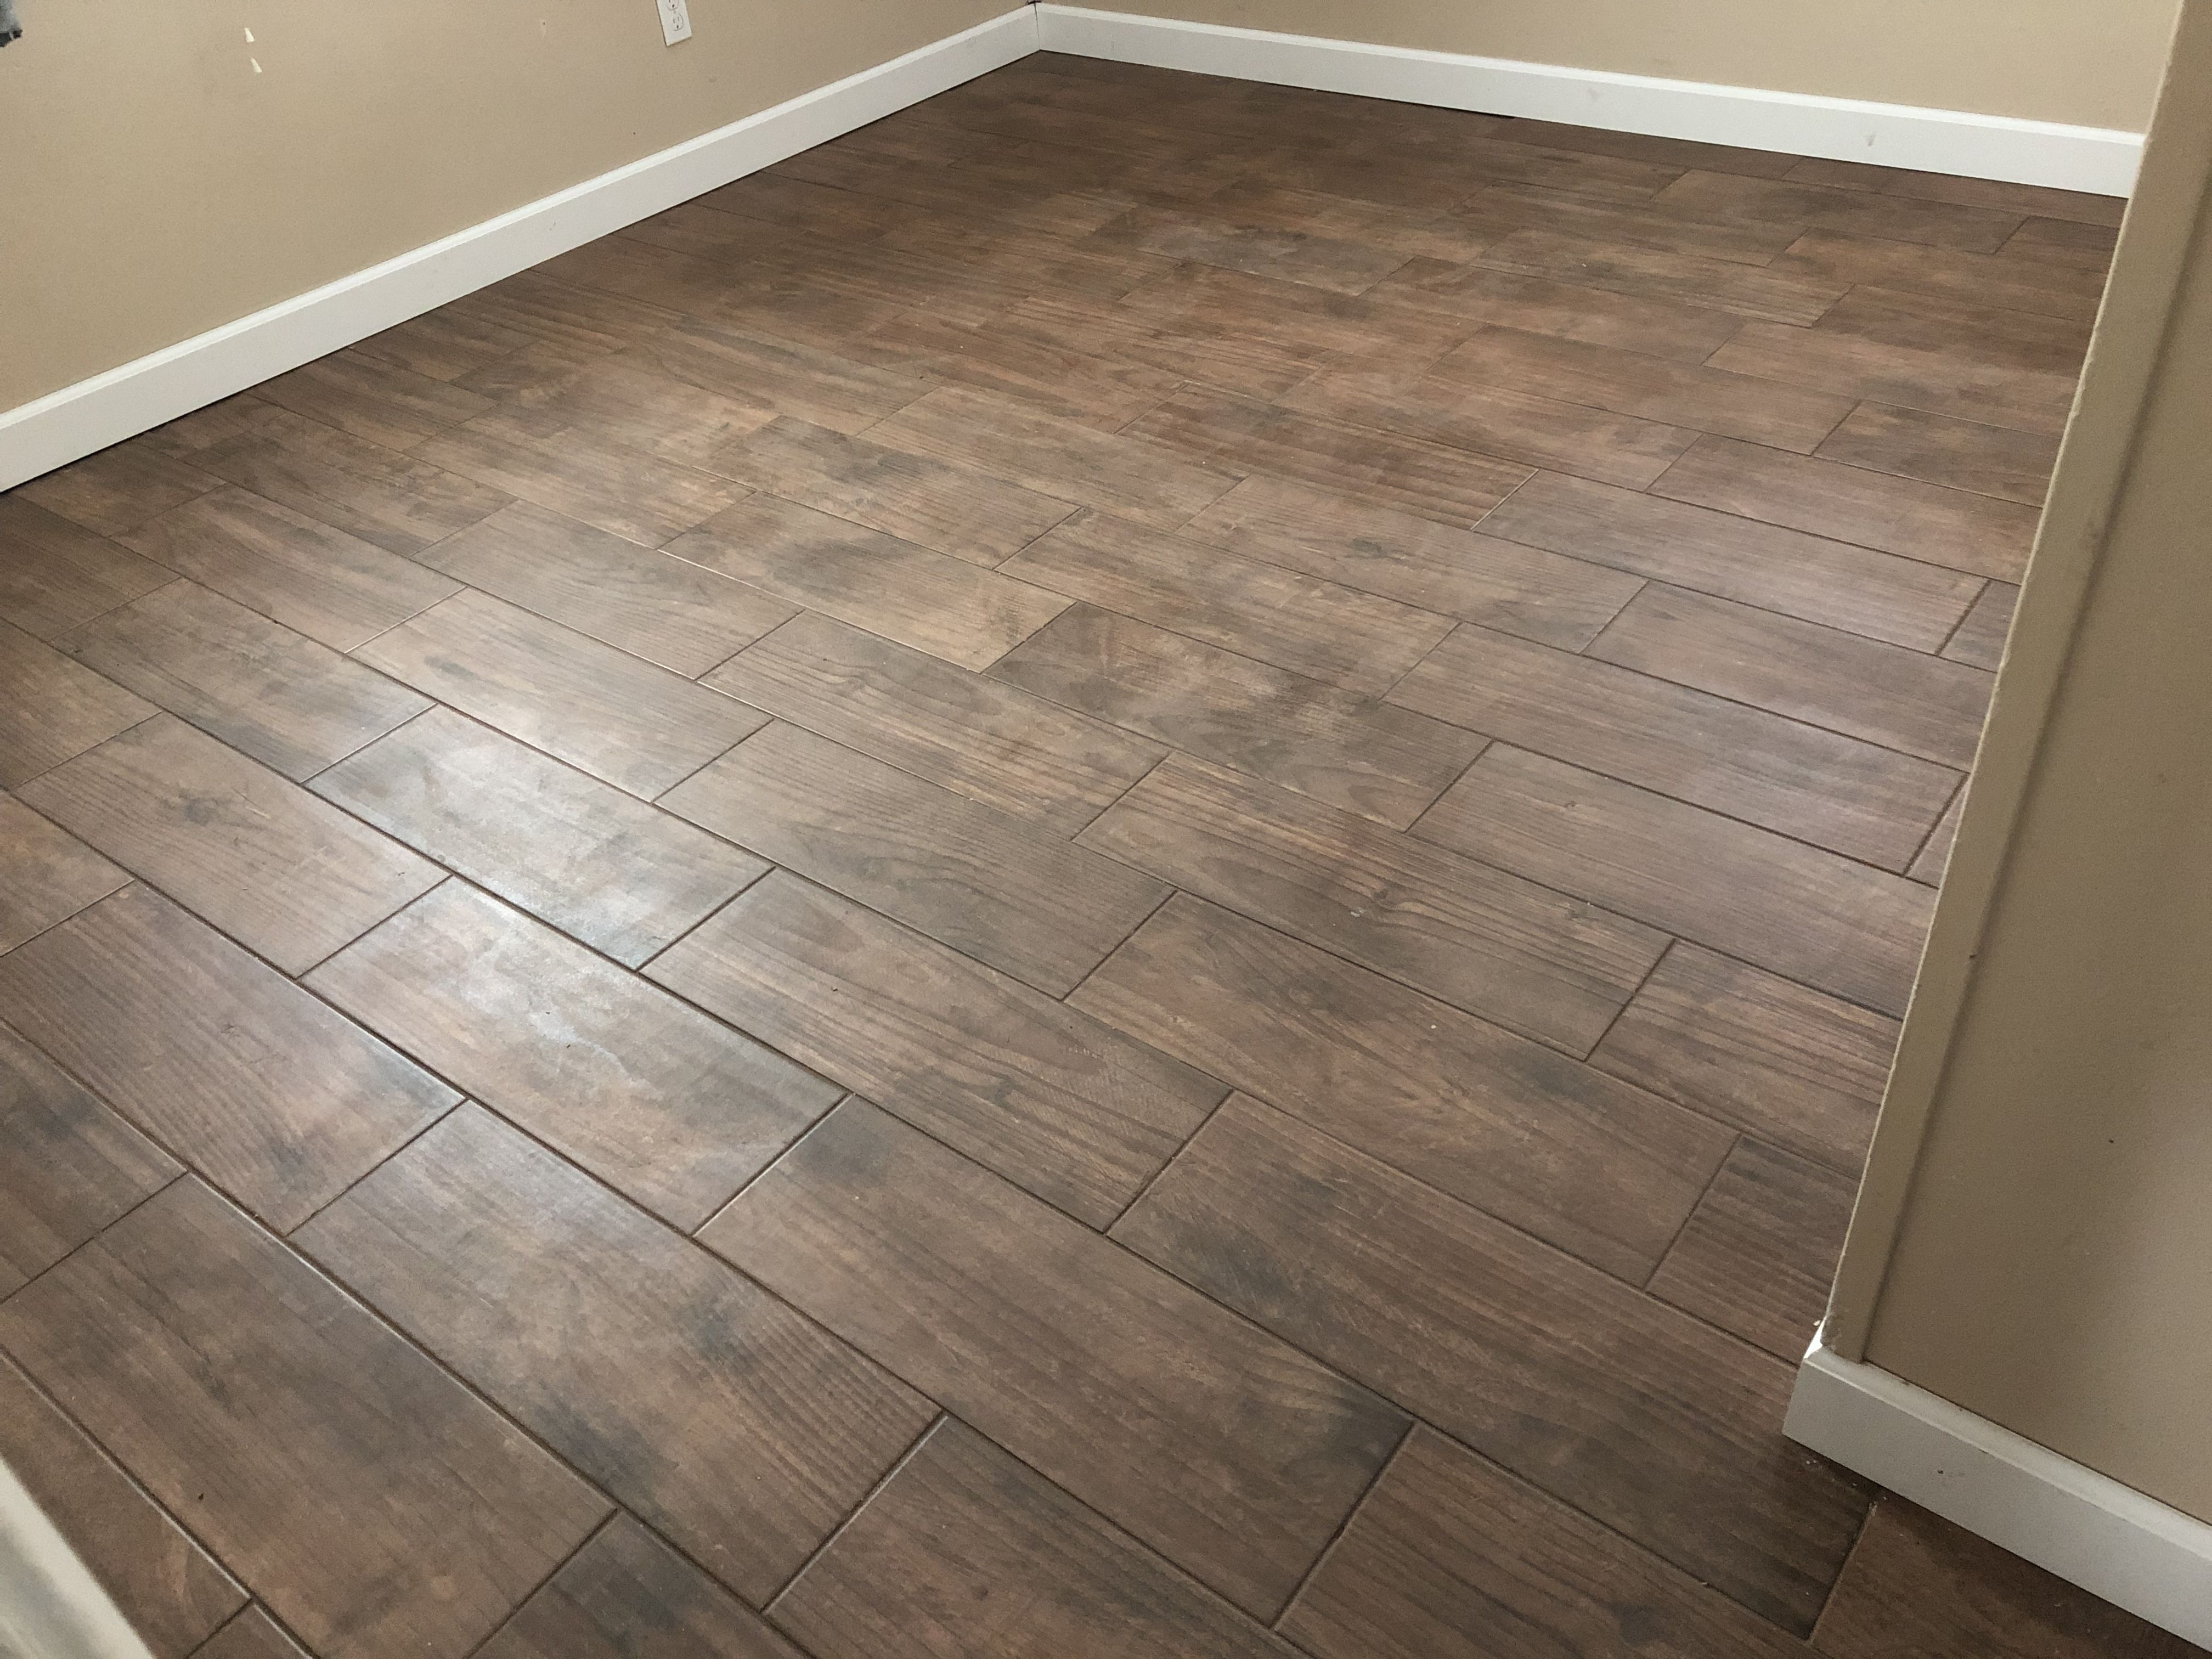 Ceramic Wood Look Tile Wood Look Tile Ceramic Wood Tile Floor Ceramic Wood Floors